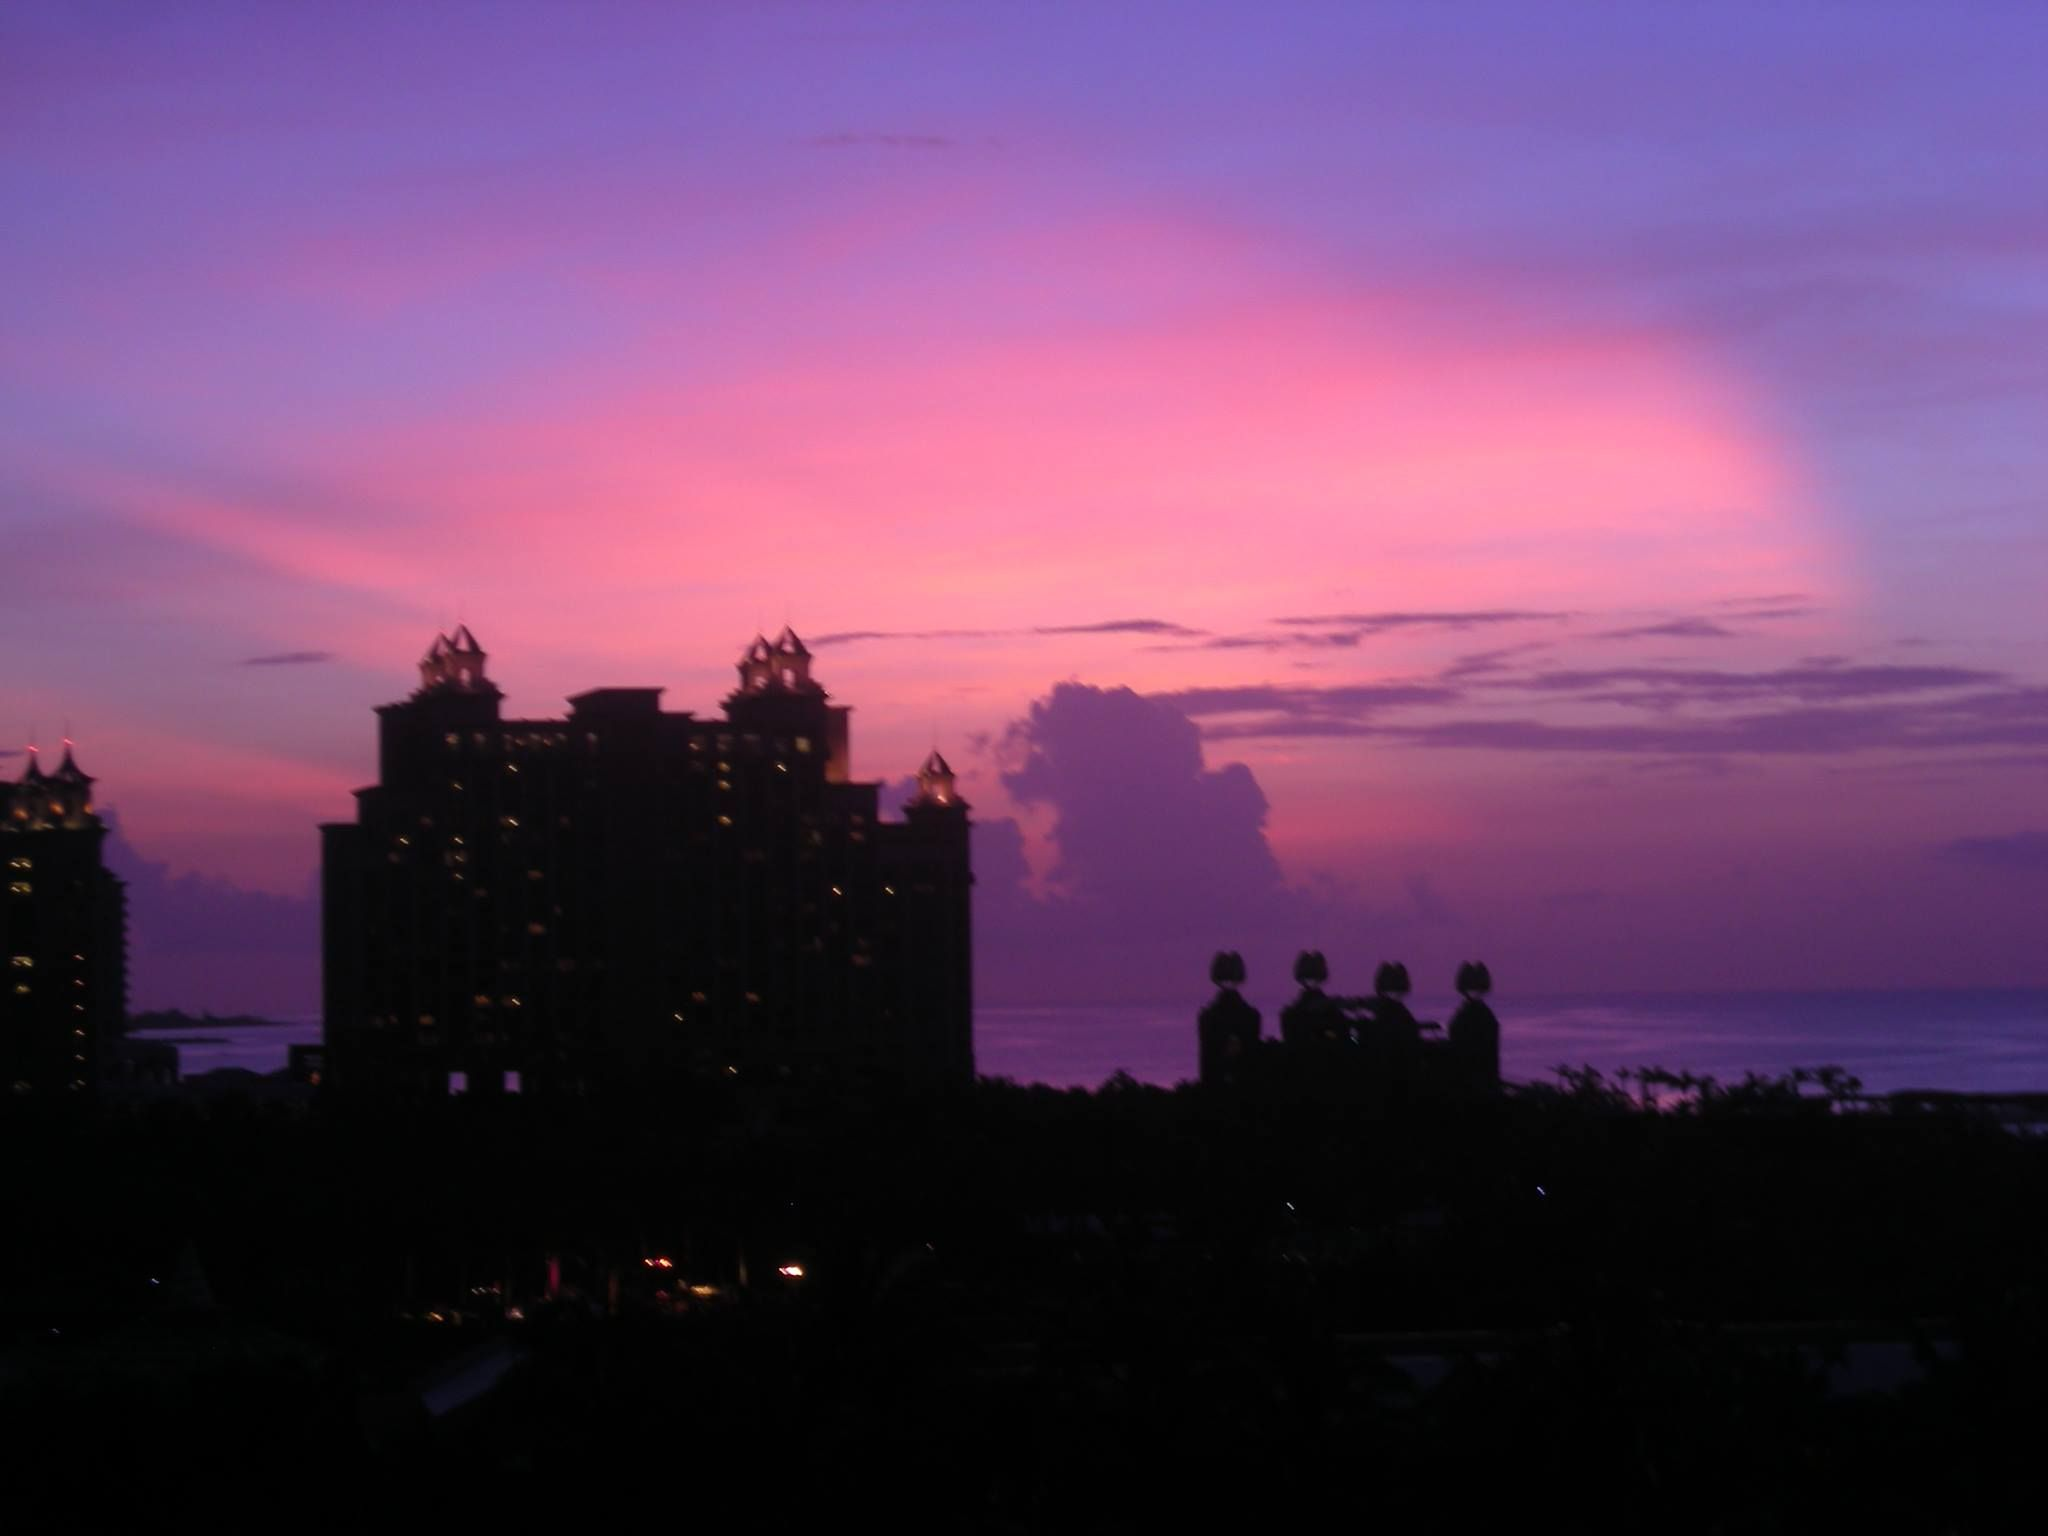 Beautiful pink & purple sunset over Atlantis Resort in Nassau Paradise Island, The Bahamas